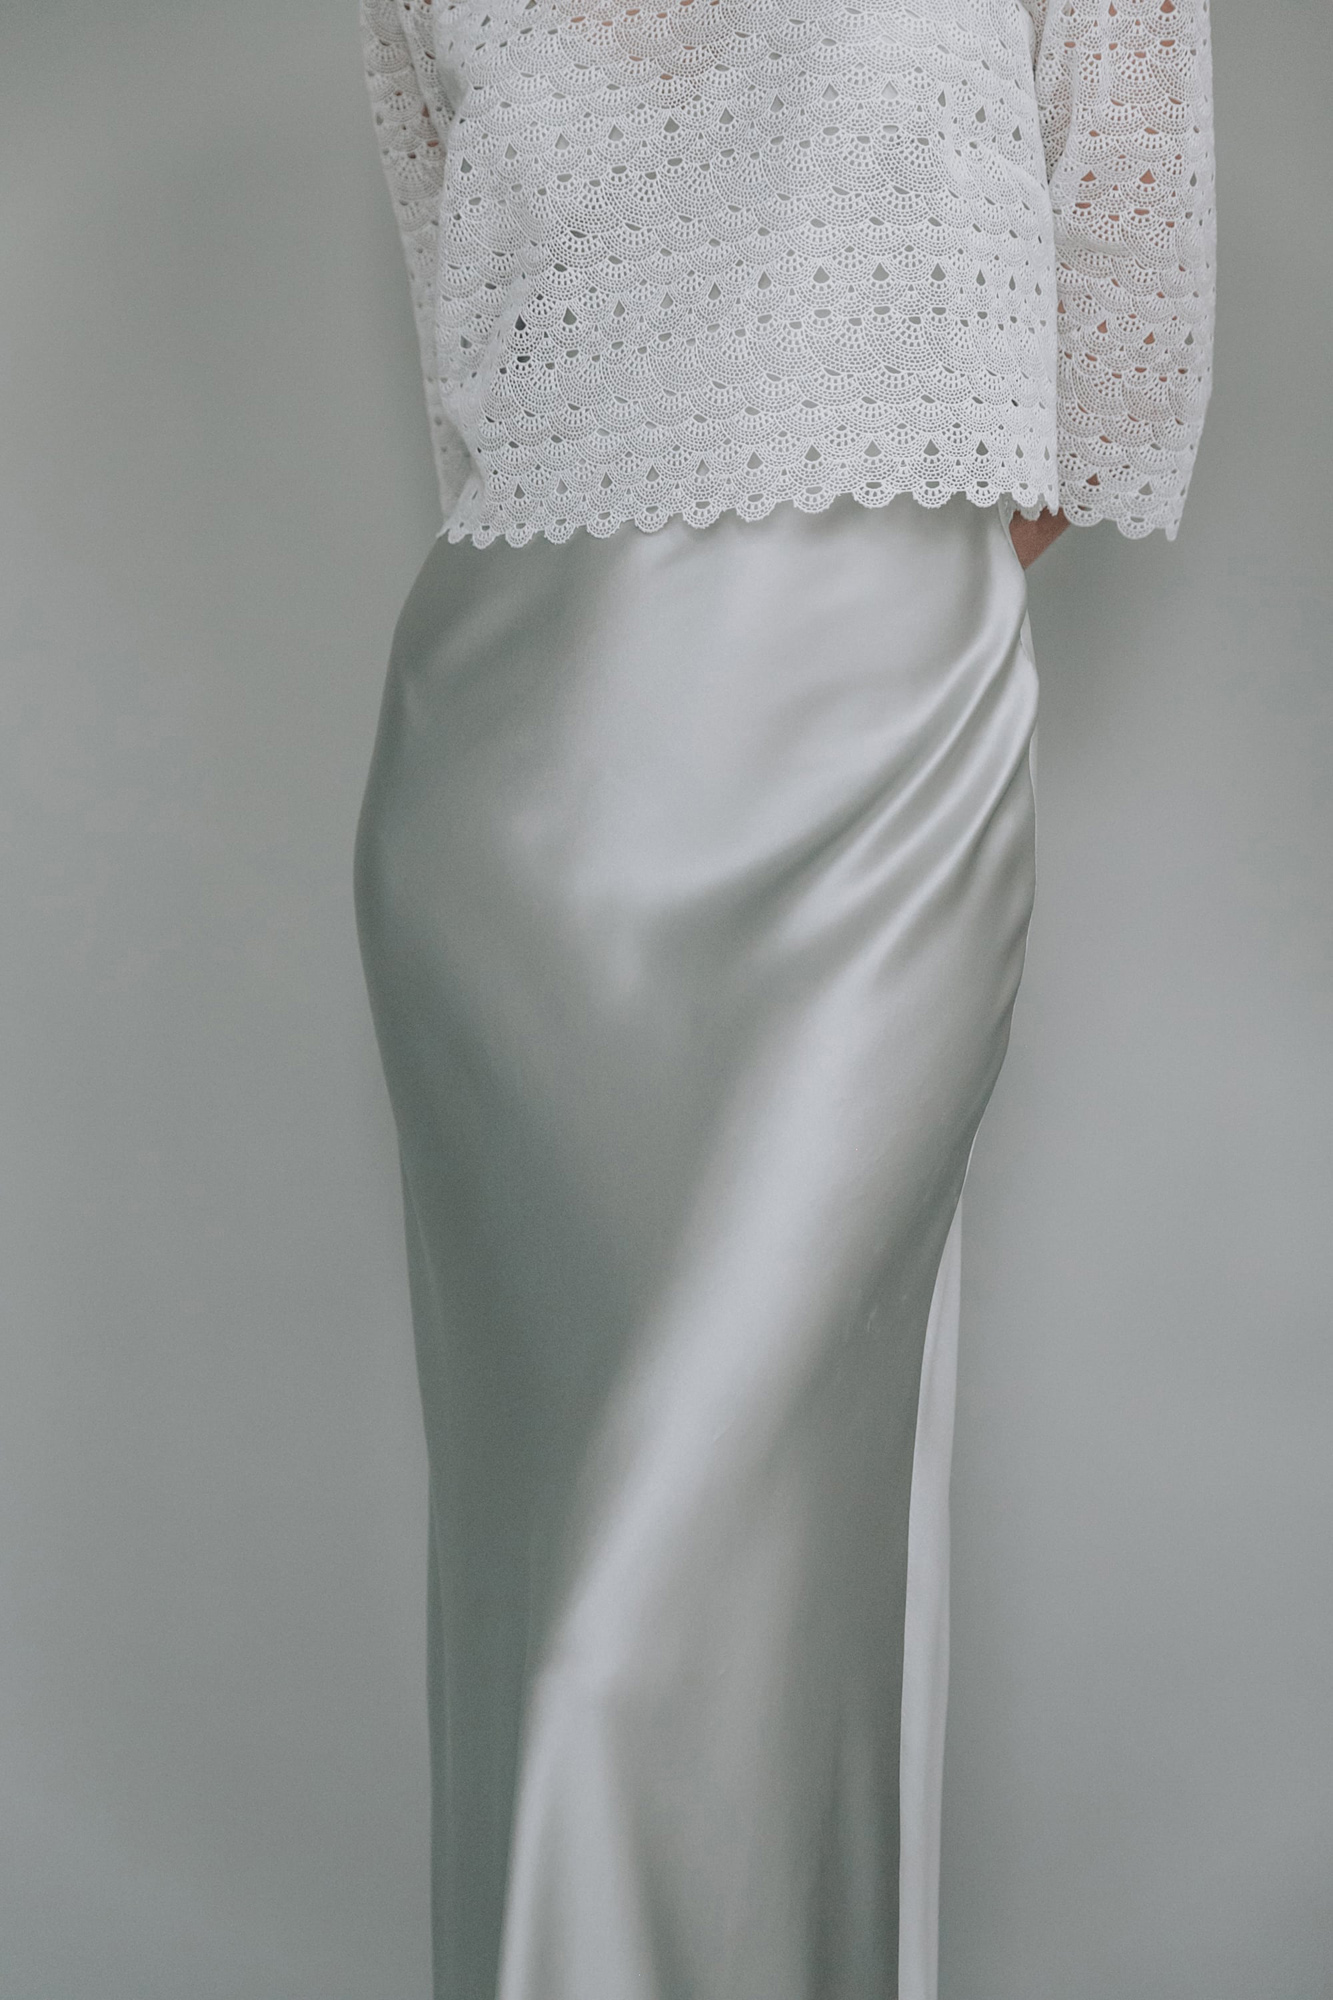 Kate-Beaumont-Sheffield-Cosmos-Minimal-Modern-Silver-Silk-Slip-Wedding-Dress-11.jpg